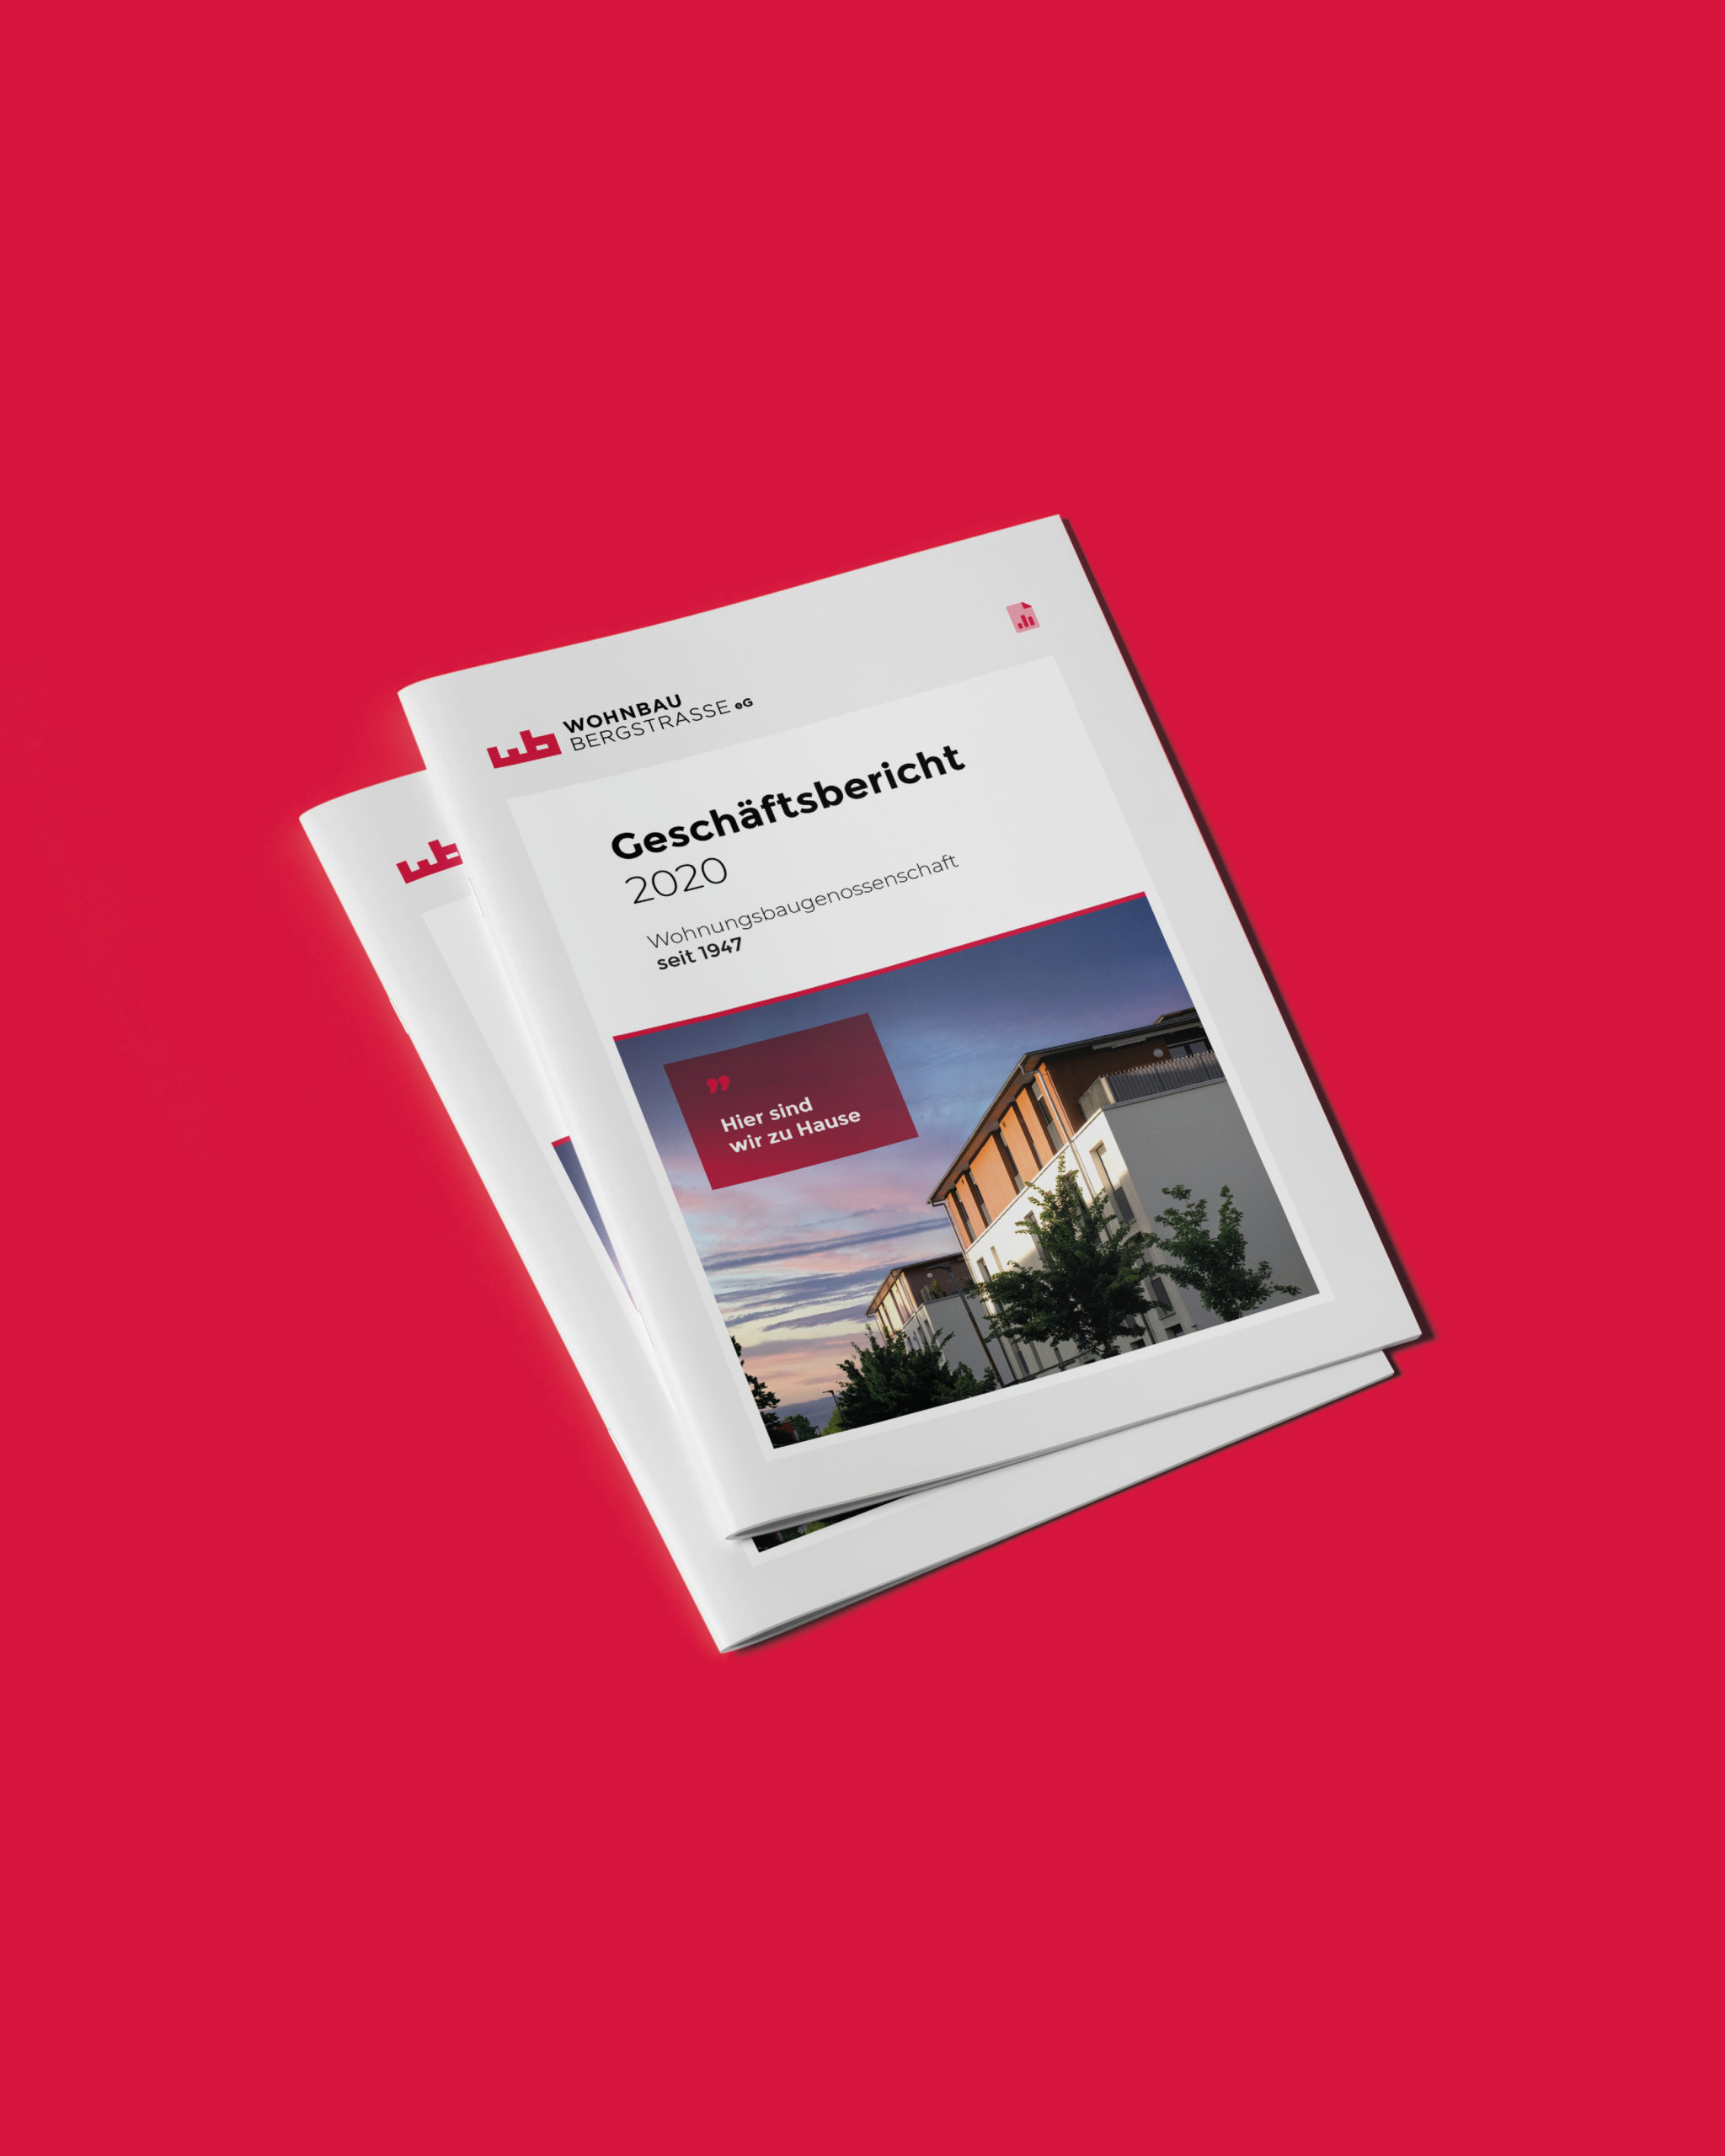 Wohnbau Bergstrasse eG, Geschäftsbericht 2020, Friedemann Hertrampf